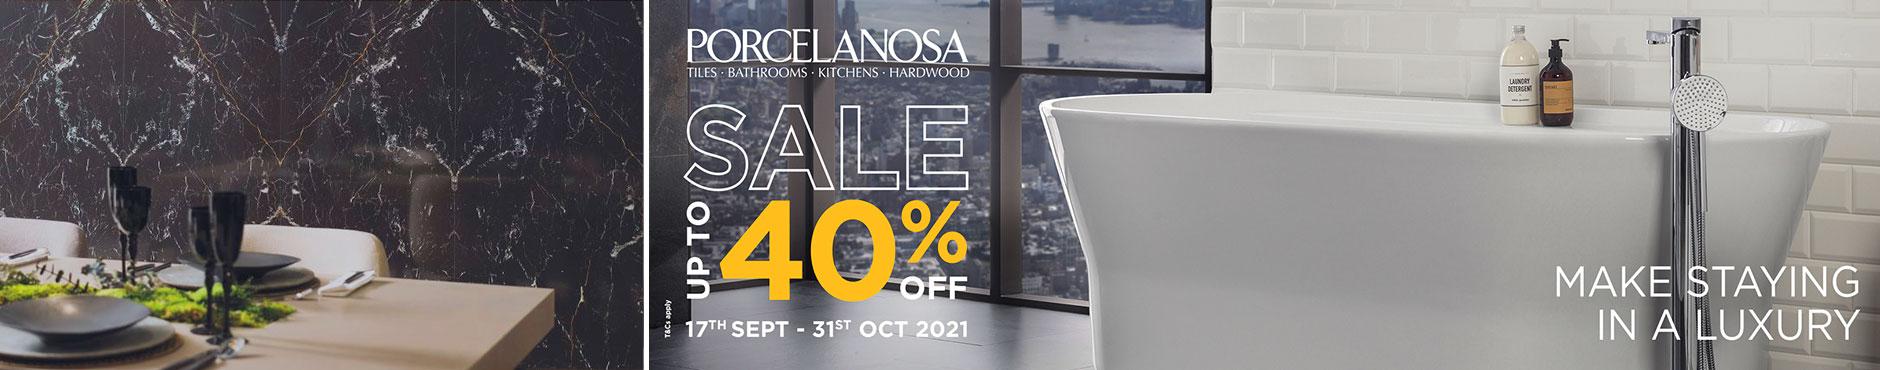 Porcelanosa Sale: 17th Sept - 31st Oct 2021